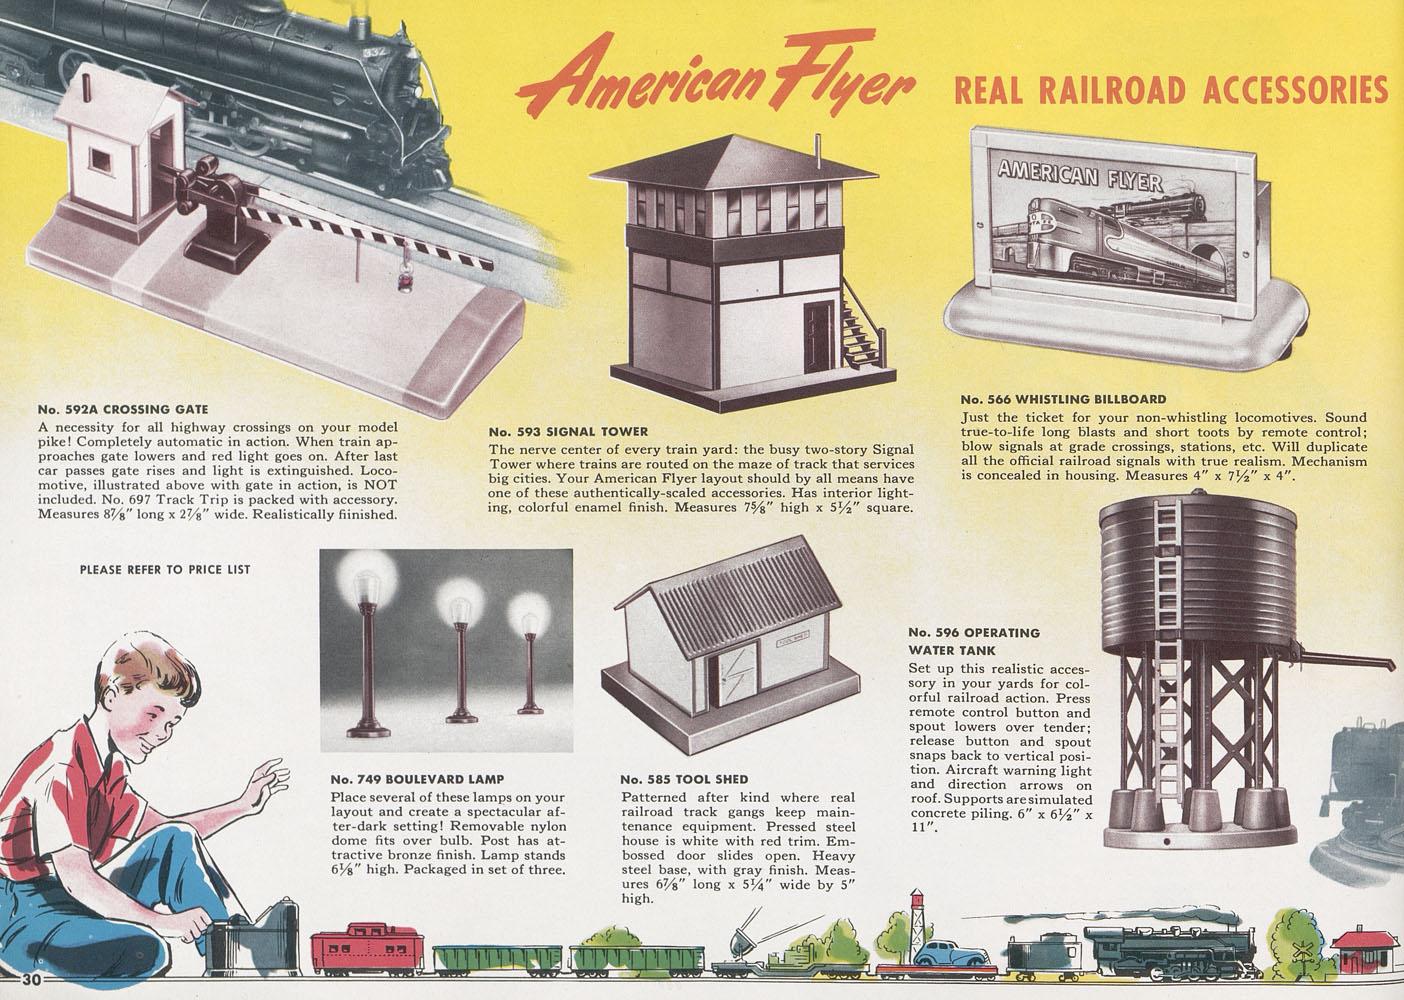 conrad-antiquario Katalogarchiv American Flyer 1952 on